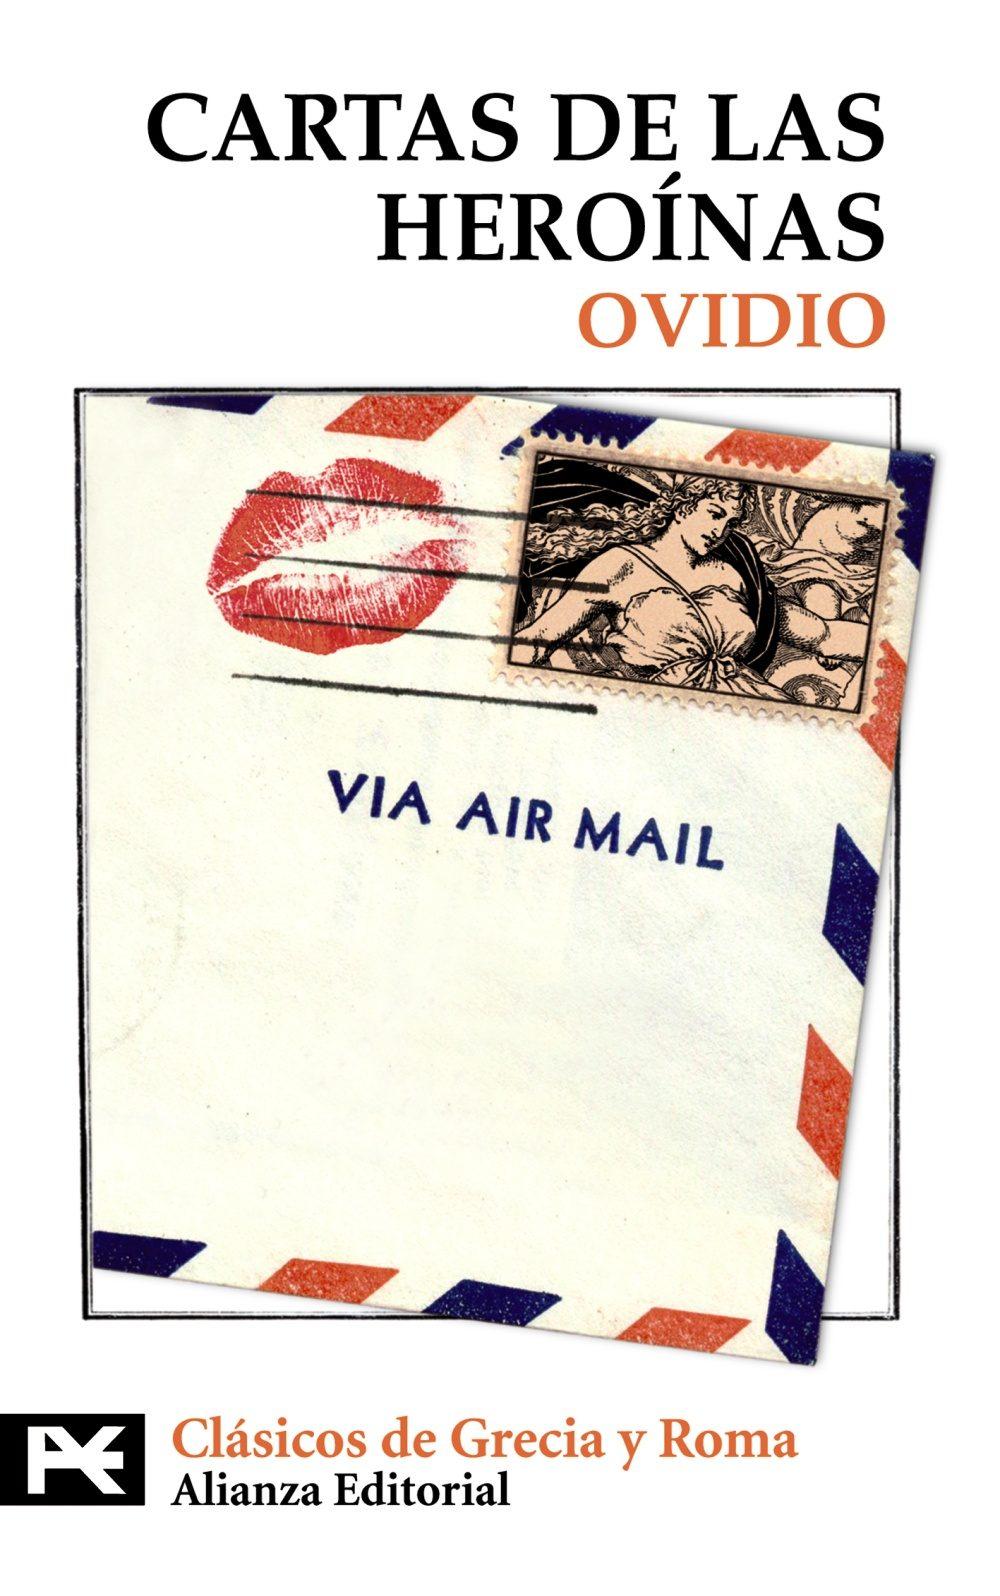 Cartas De Las Heroinas por Publio Ovidio Nason;                                                                                    Vicente Cristobal Lopez epub